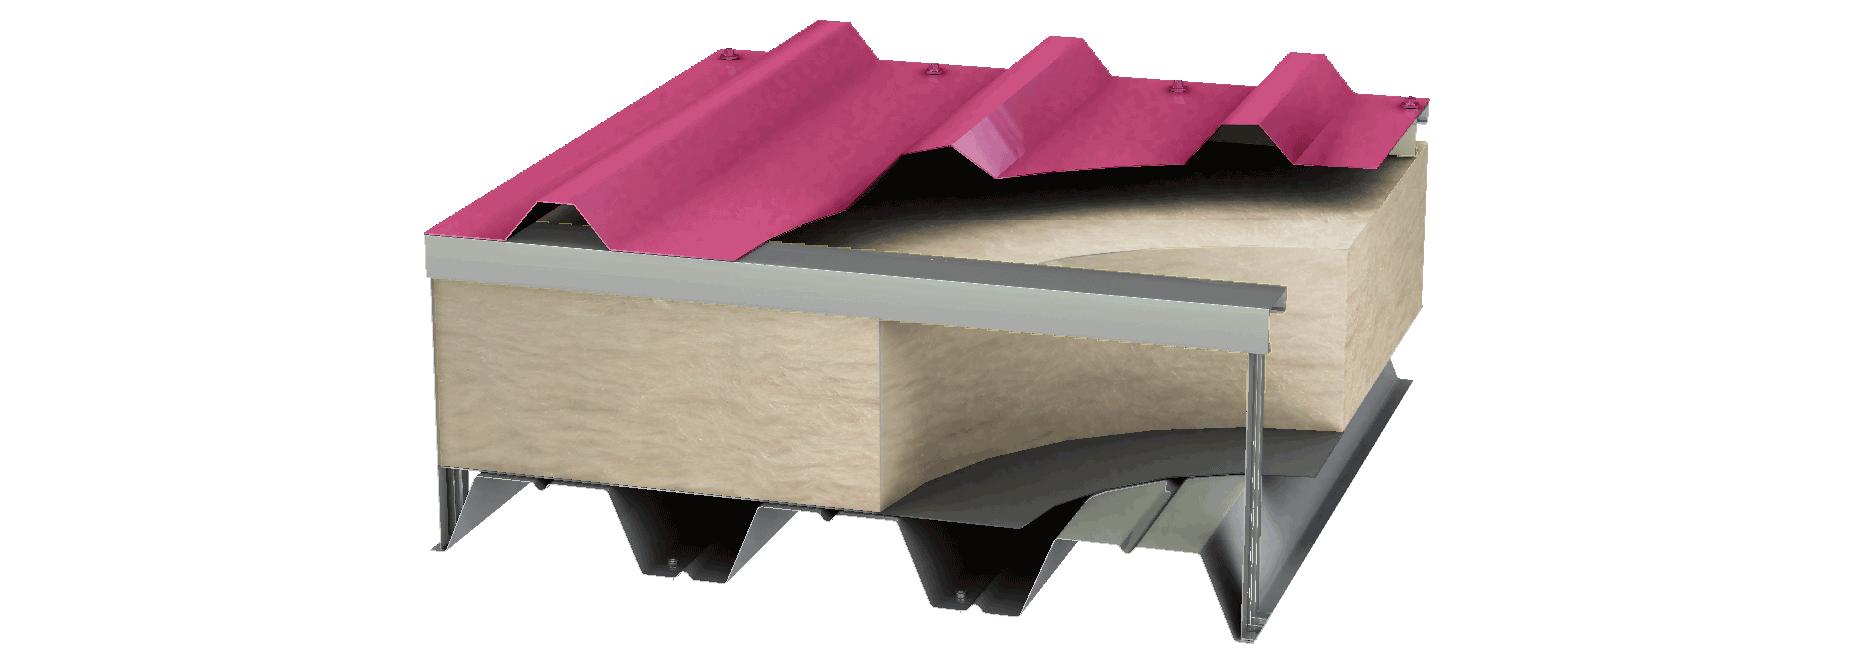 Metal roof deck